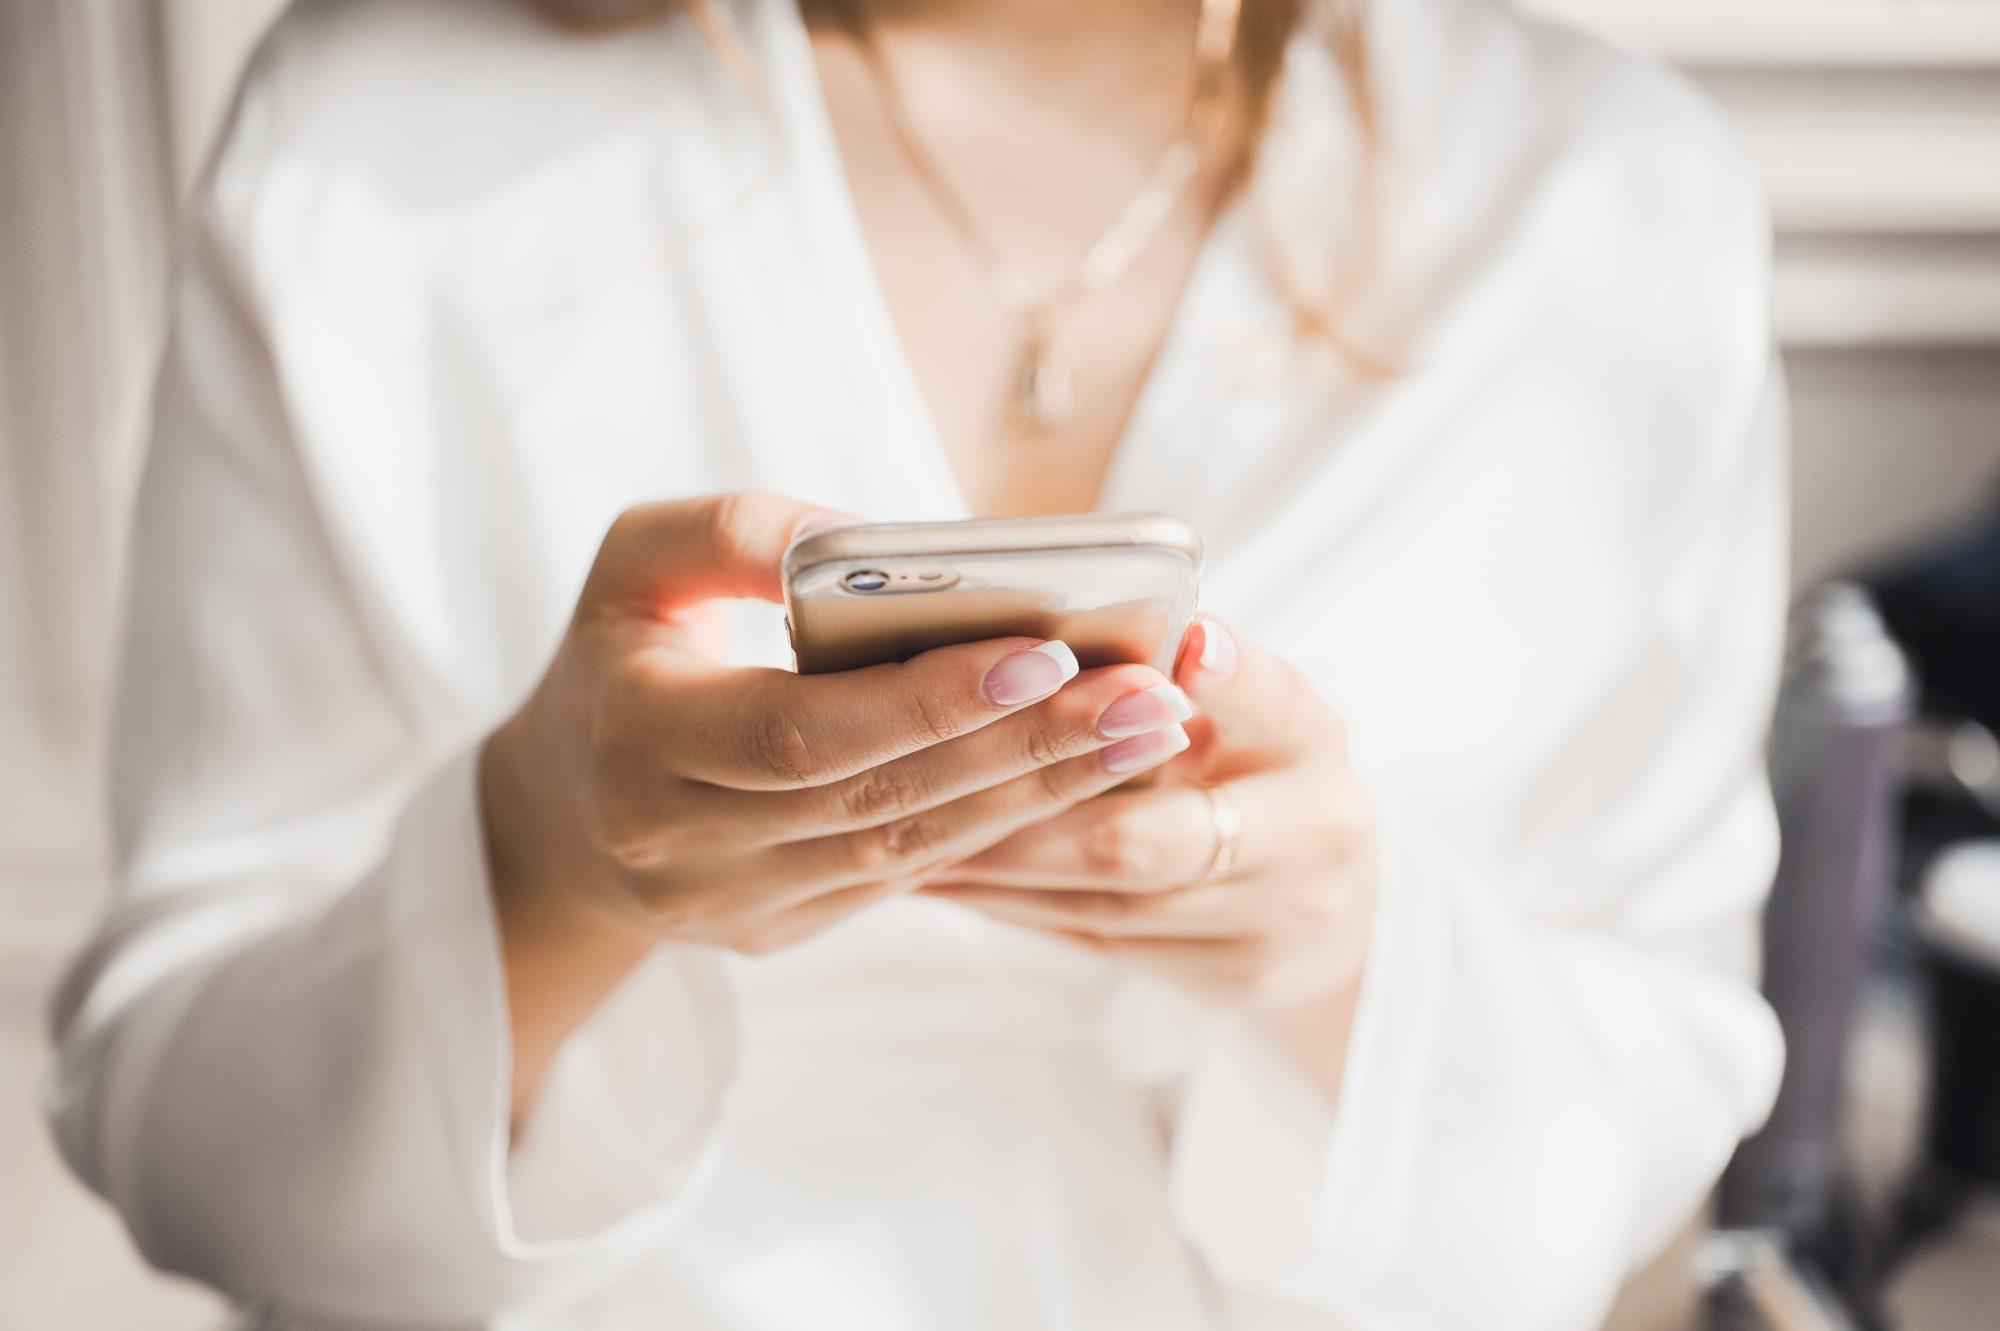 girl-holding-iphone-pregnancy